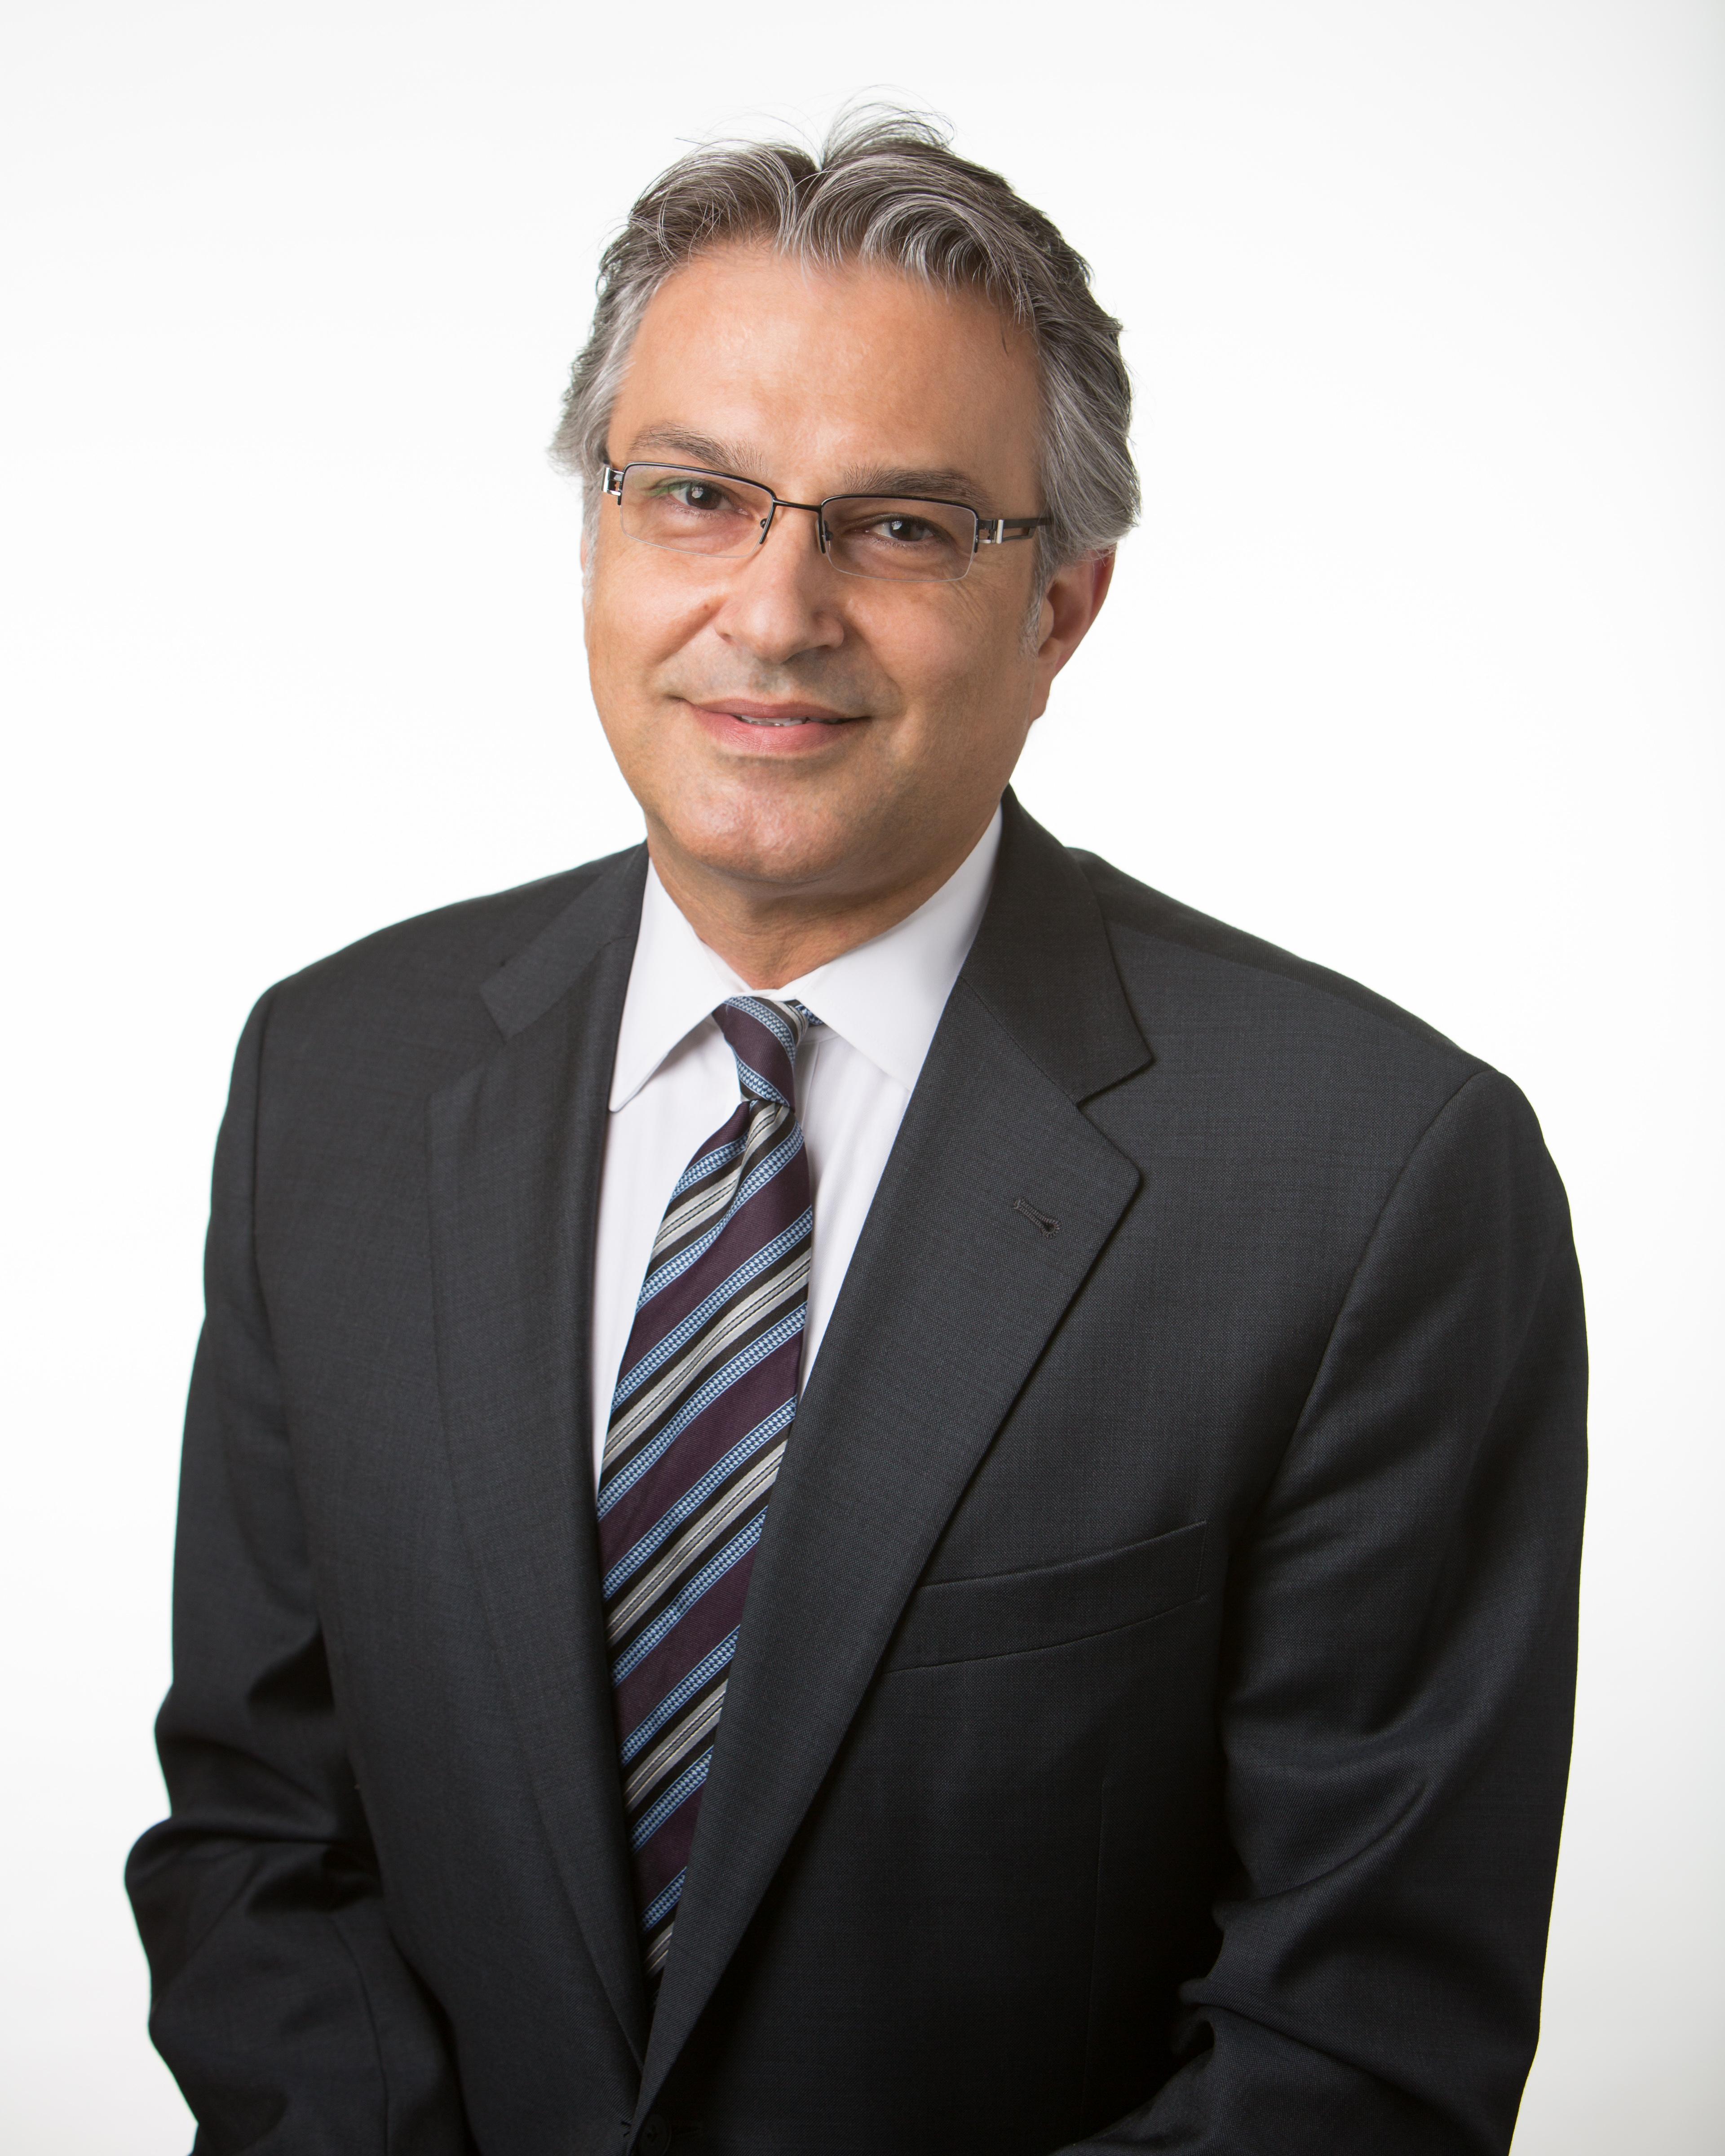 Andre Amini